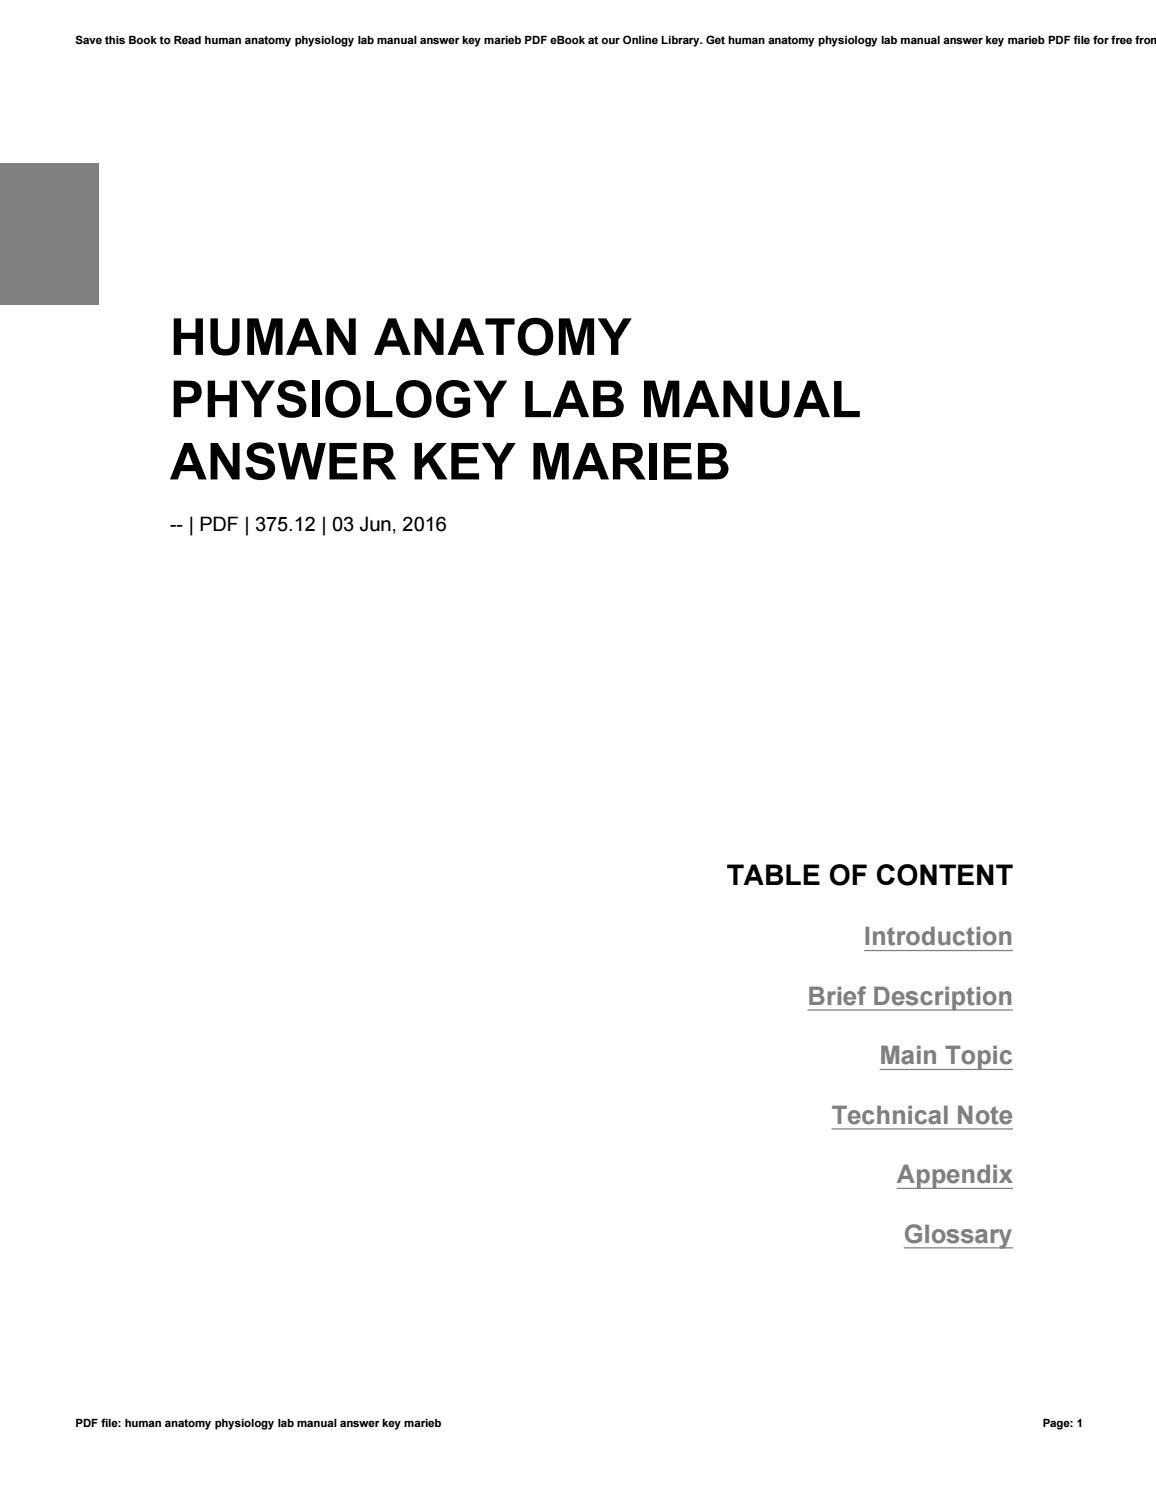 Human anatomy physiology lab manual answer key marieb by hezll37 - issuu